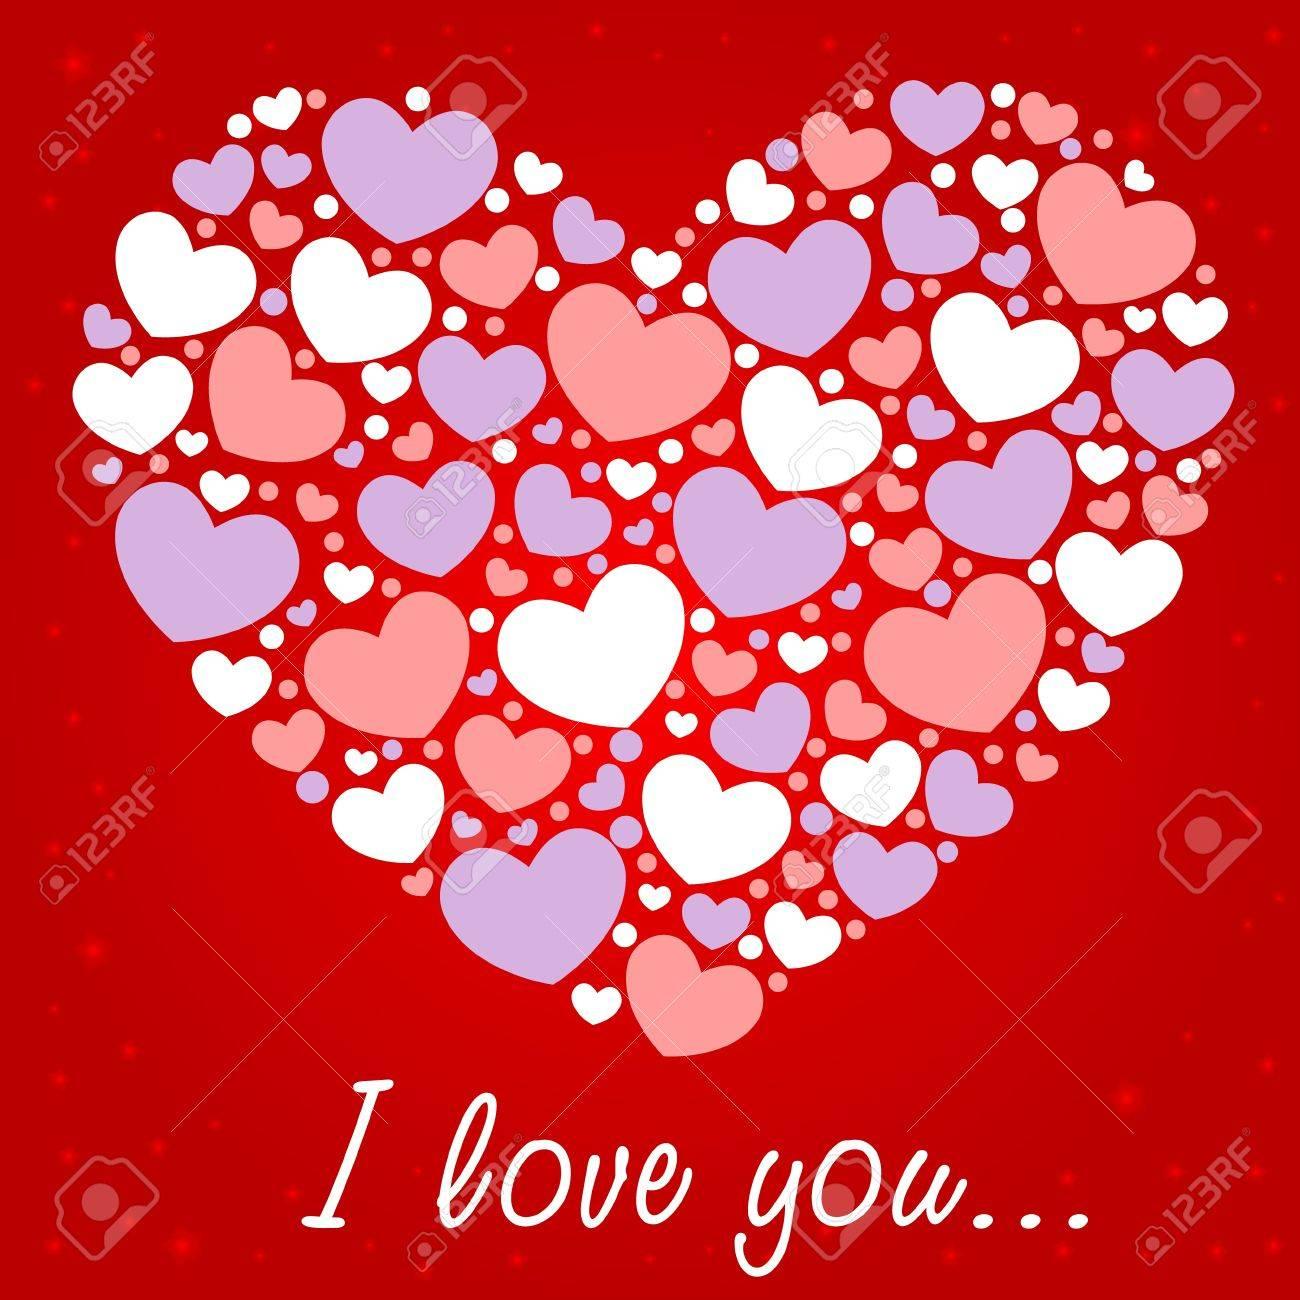 Cute Valentine love congratulation card with border of hearts Stock Vector - 11941497